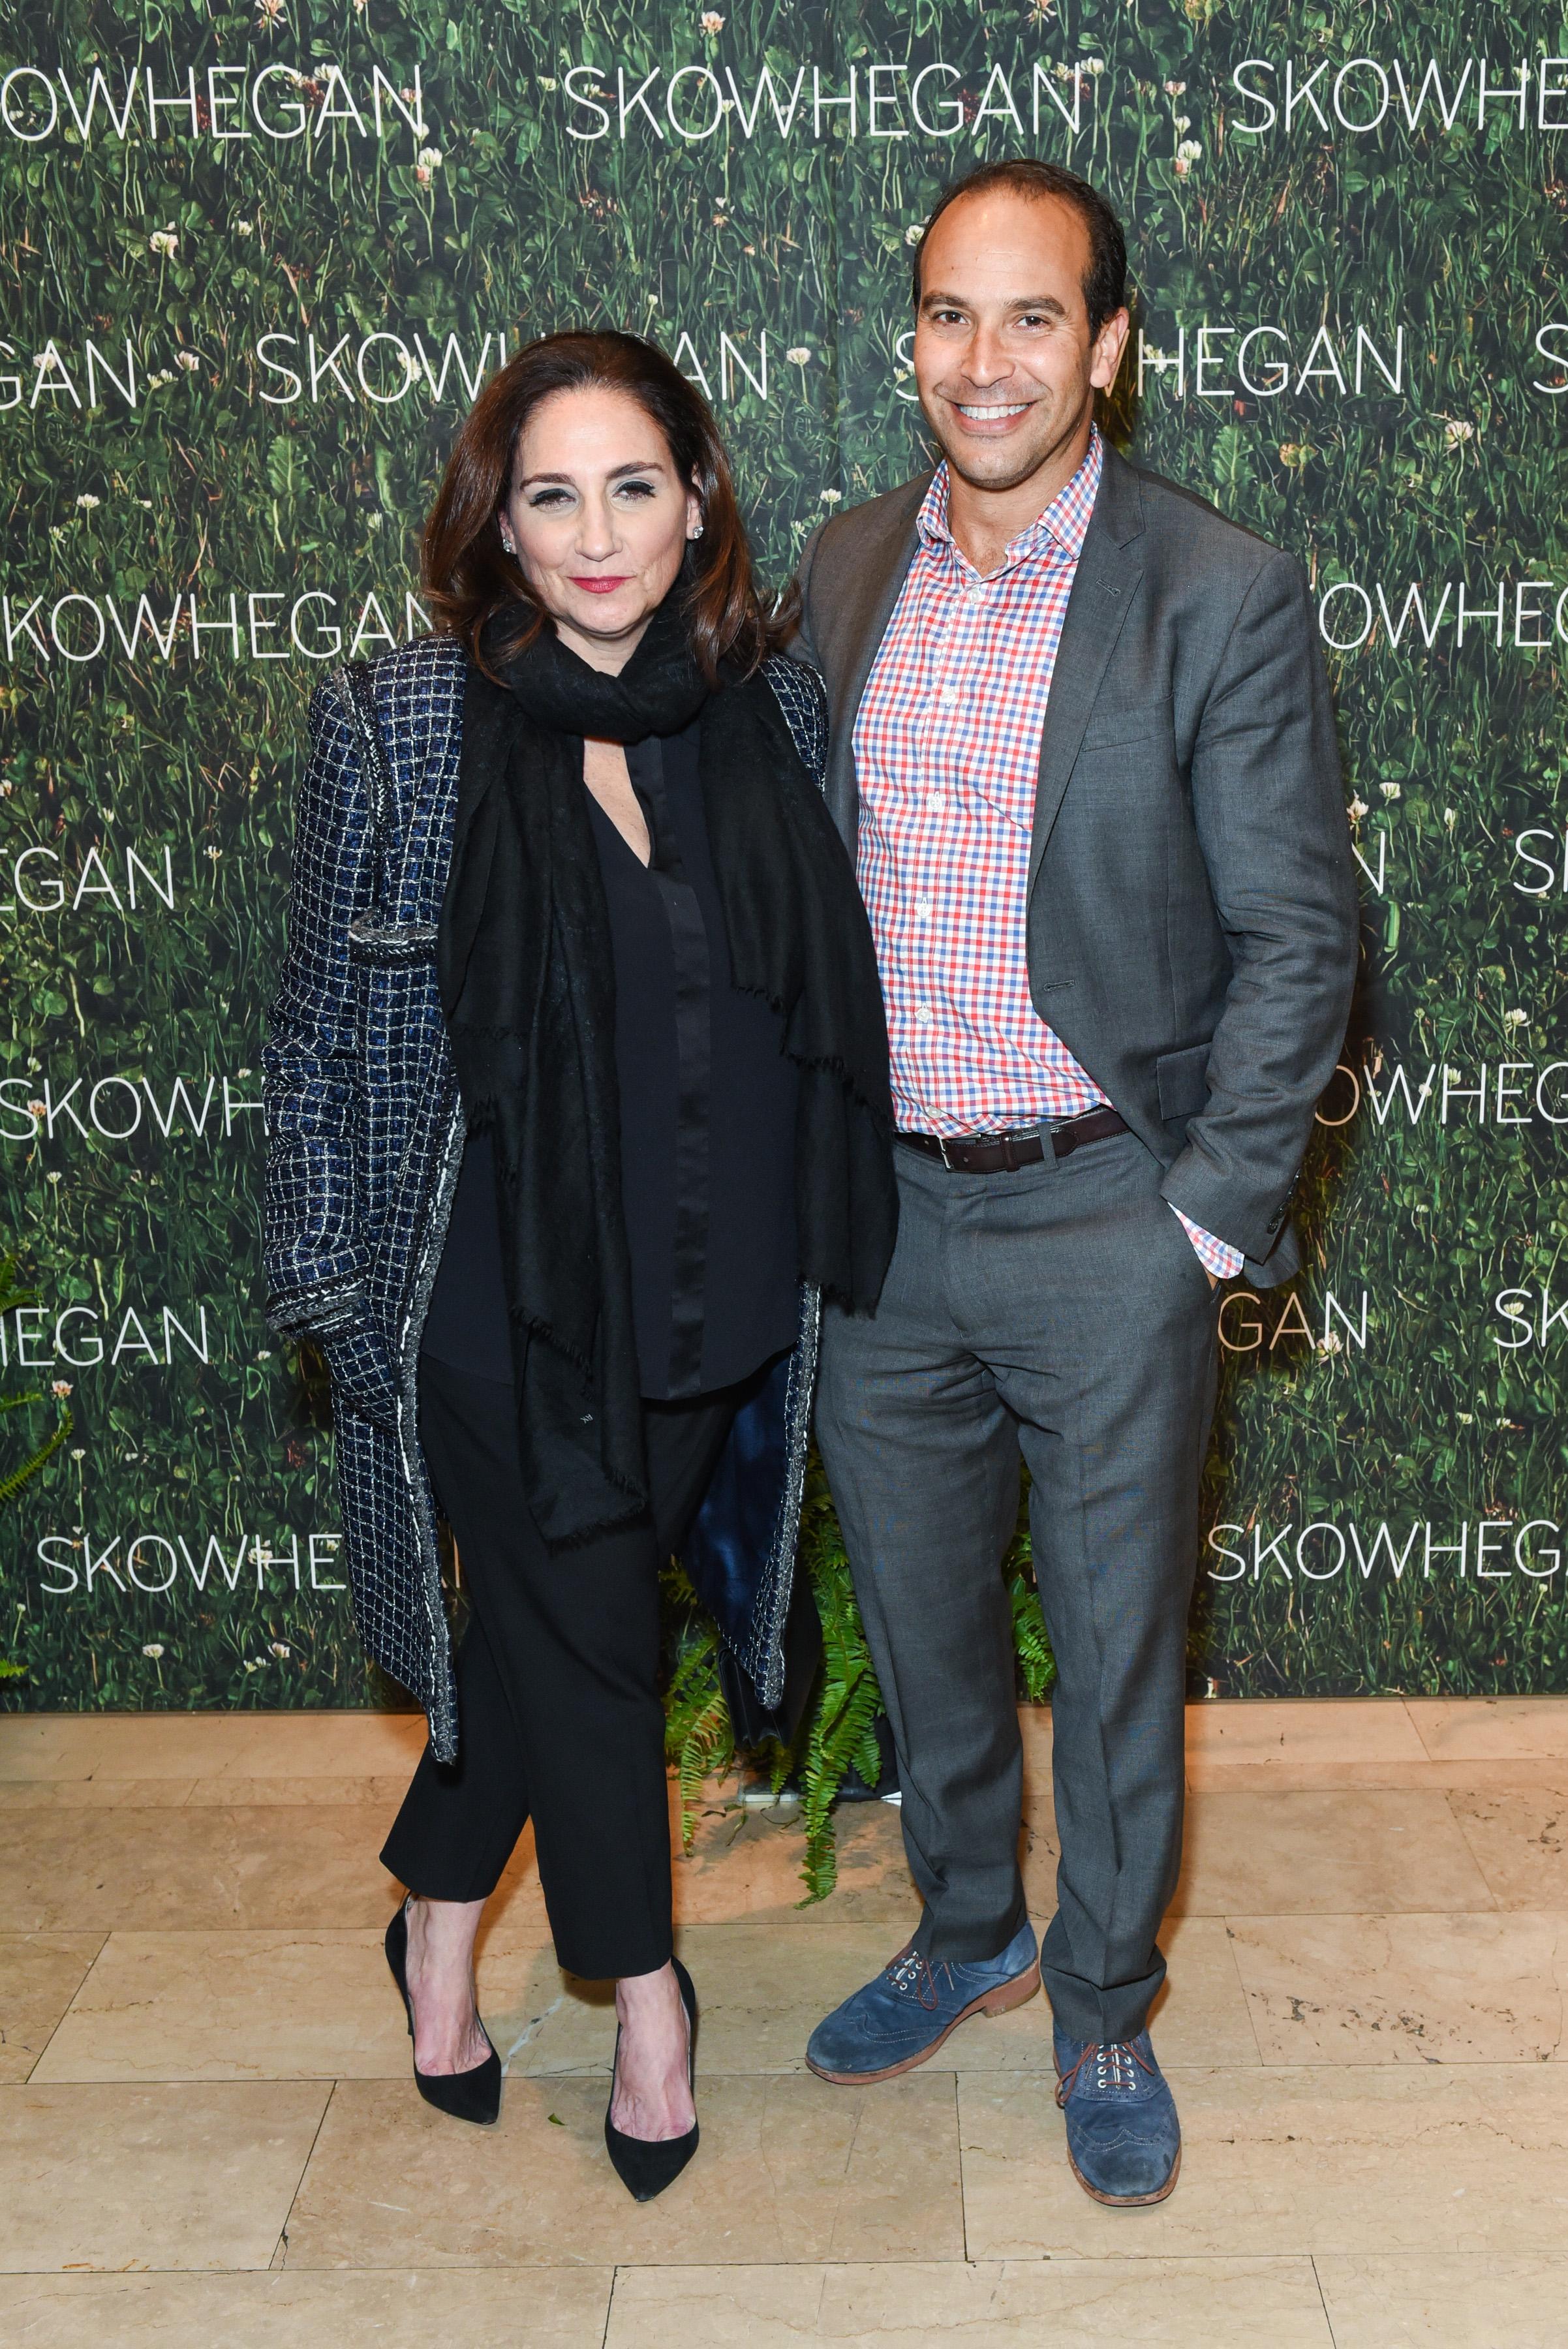 Rena Hoffman, Bernard Lumpkin==Skowhegan Awards Dinner 2018==The Plaza Hotel, New York, NY==April 24, 2018==�Patrick McMullan==Photo - Presley Ann/PMC====